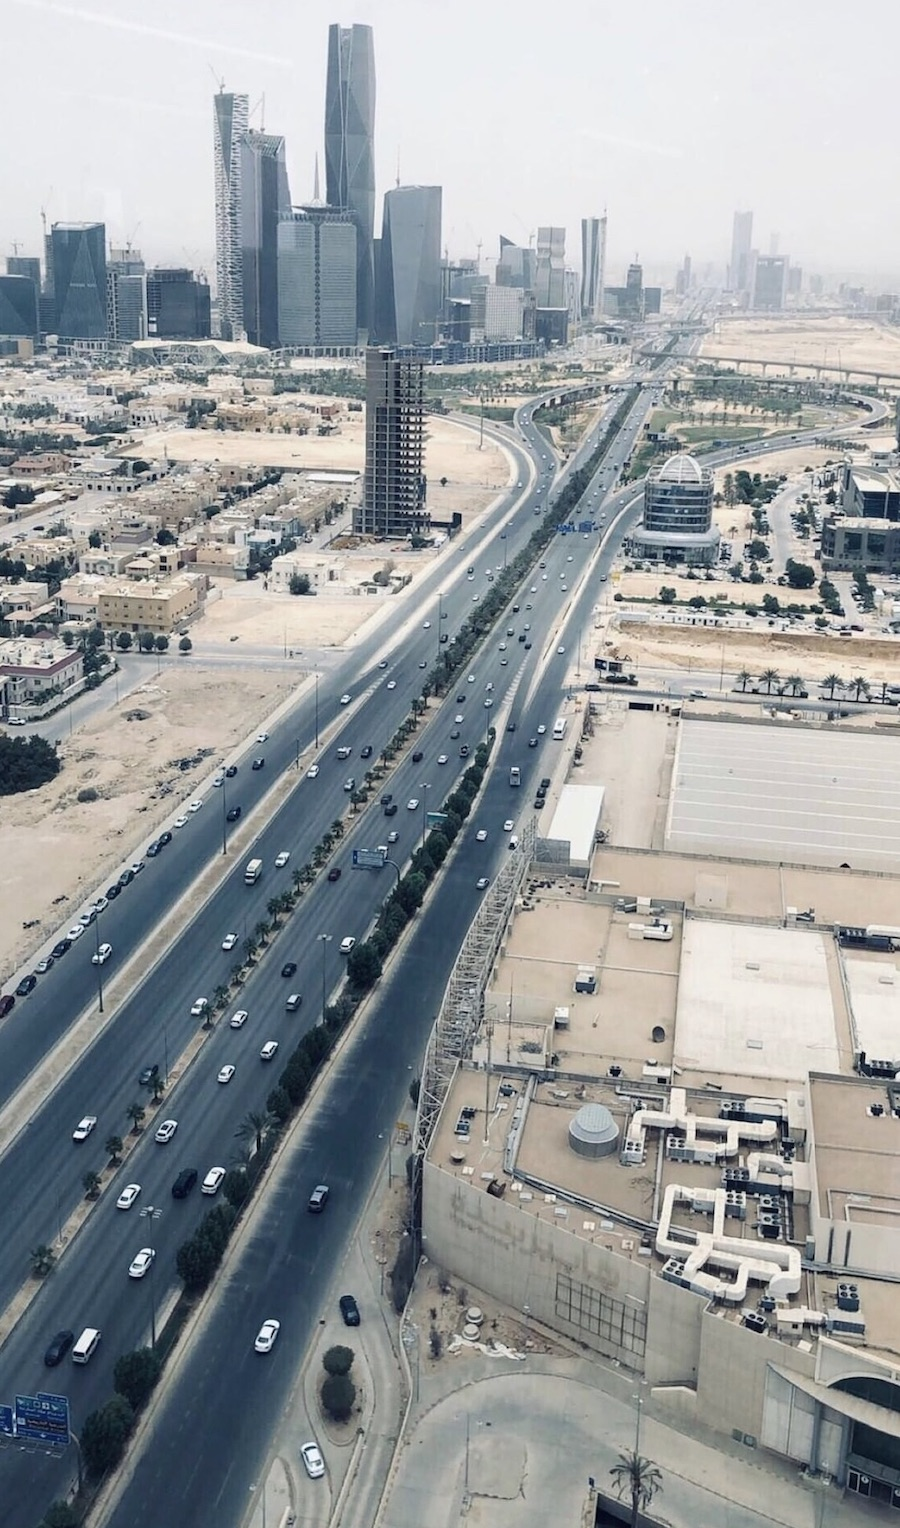 Gay in Saudi Arabien: Wie leben schwule Männer in dem islamischen Land?